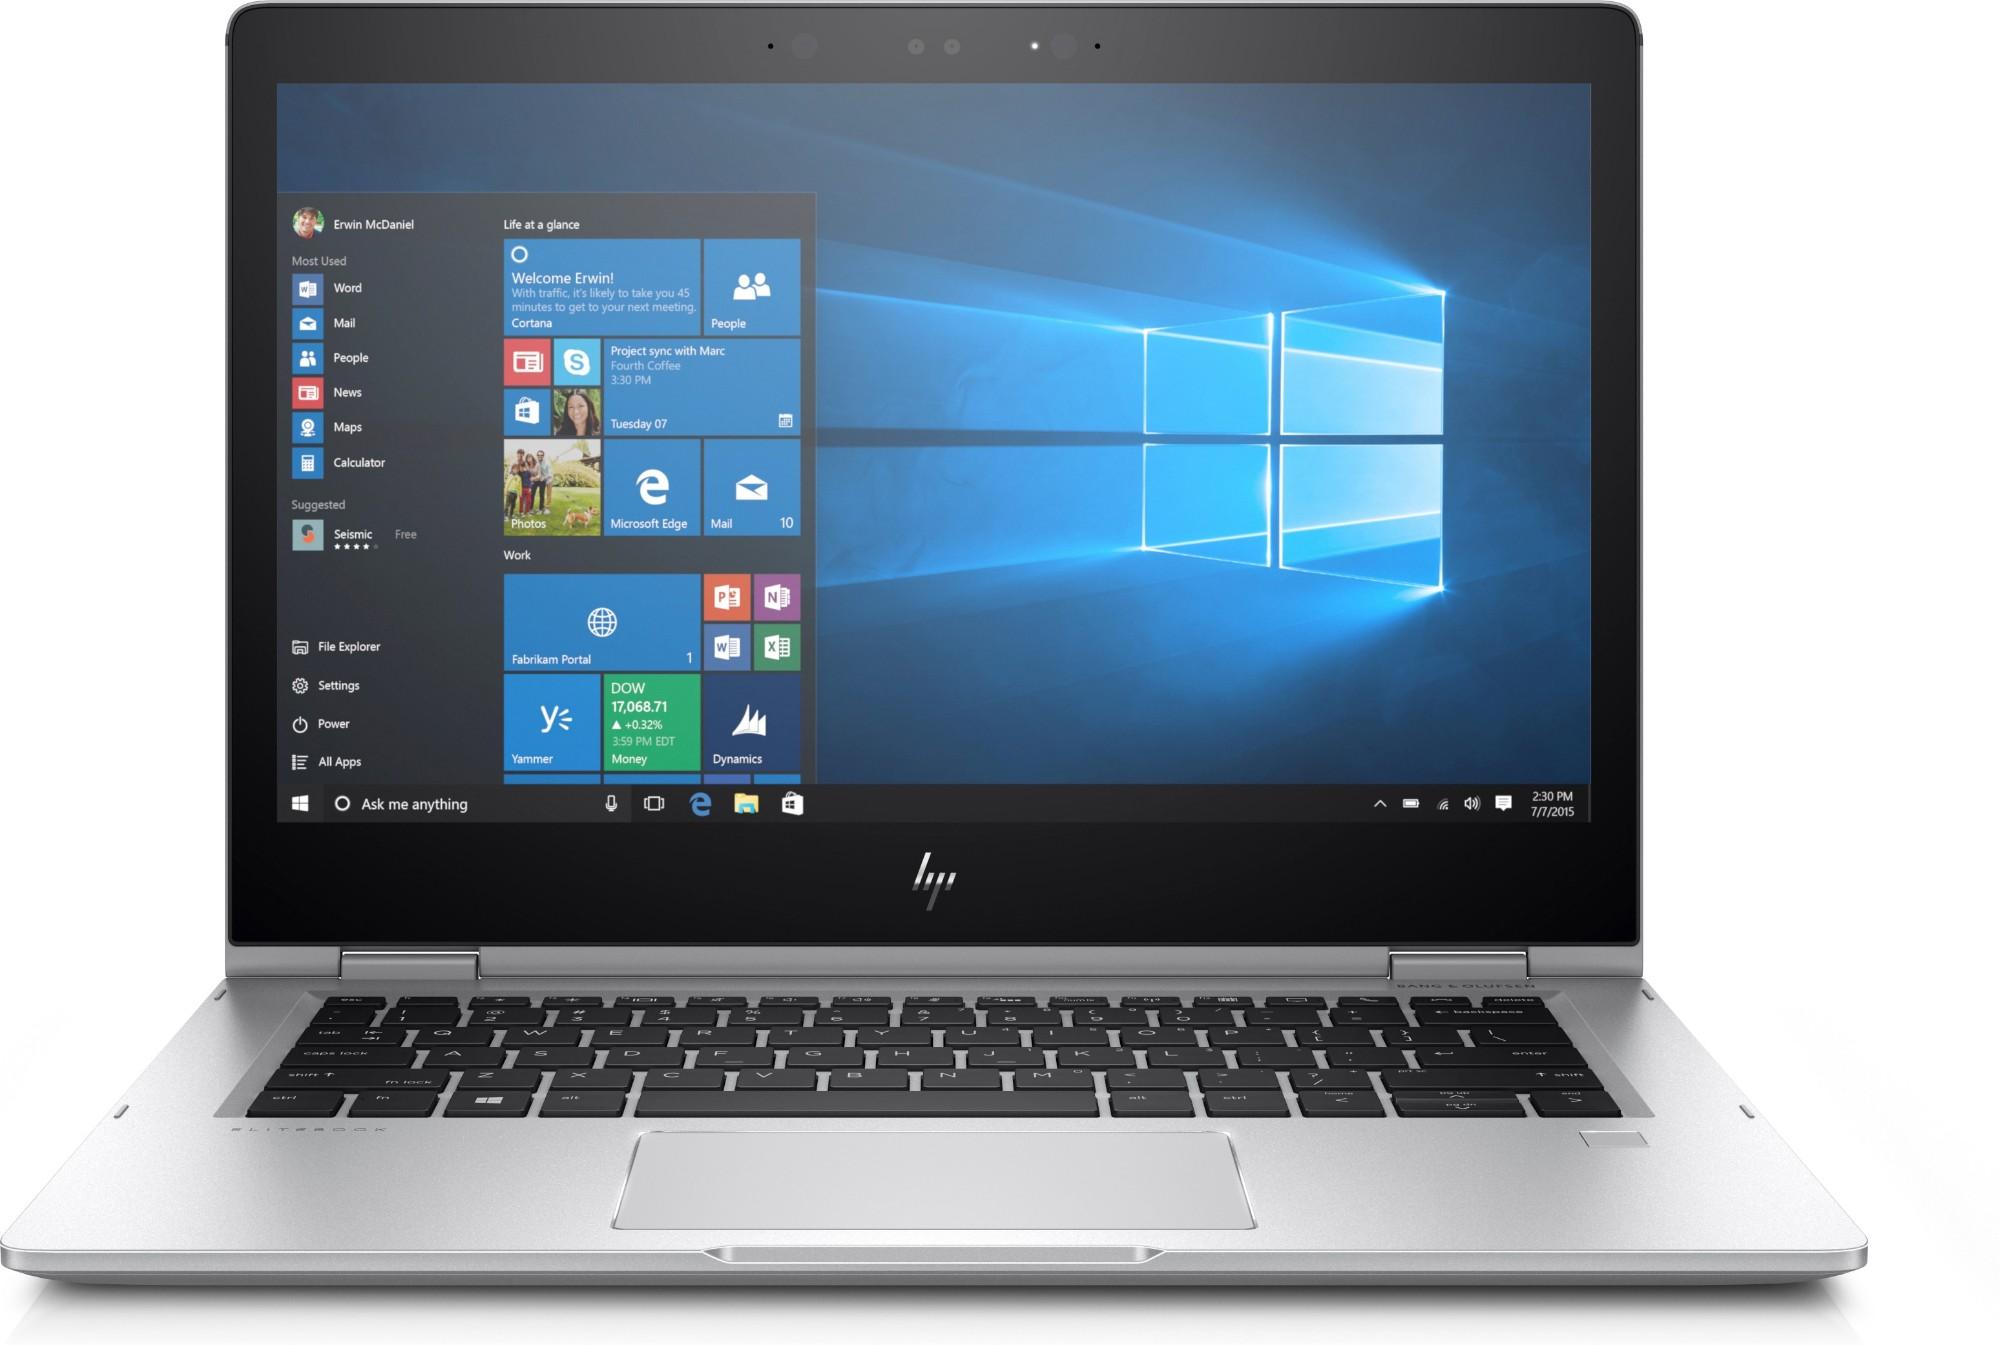 HP EliteBook x360 1030 G2 2.50GHz i5-7200U 7th gen Intel® Core™ i5 13.3